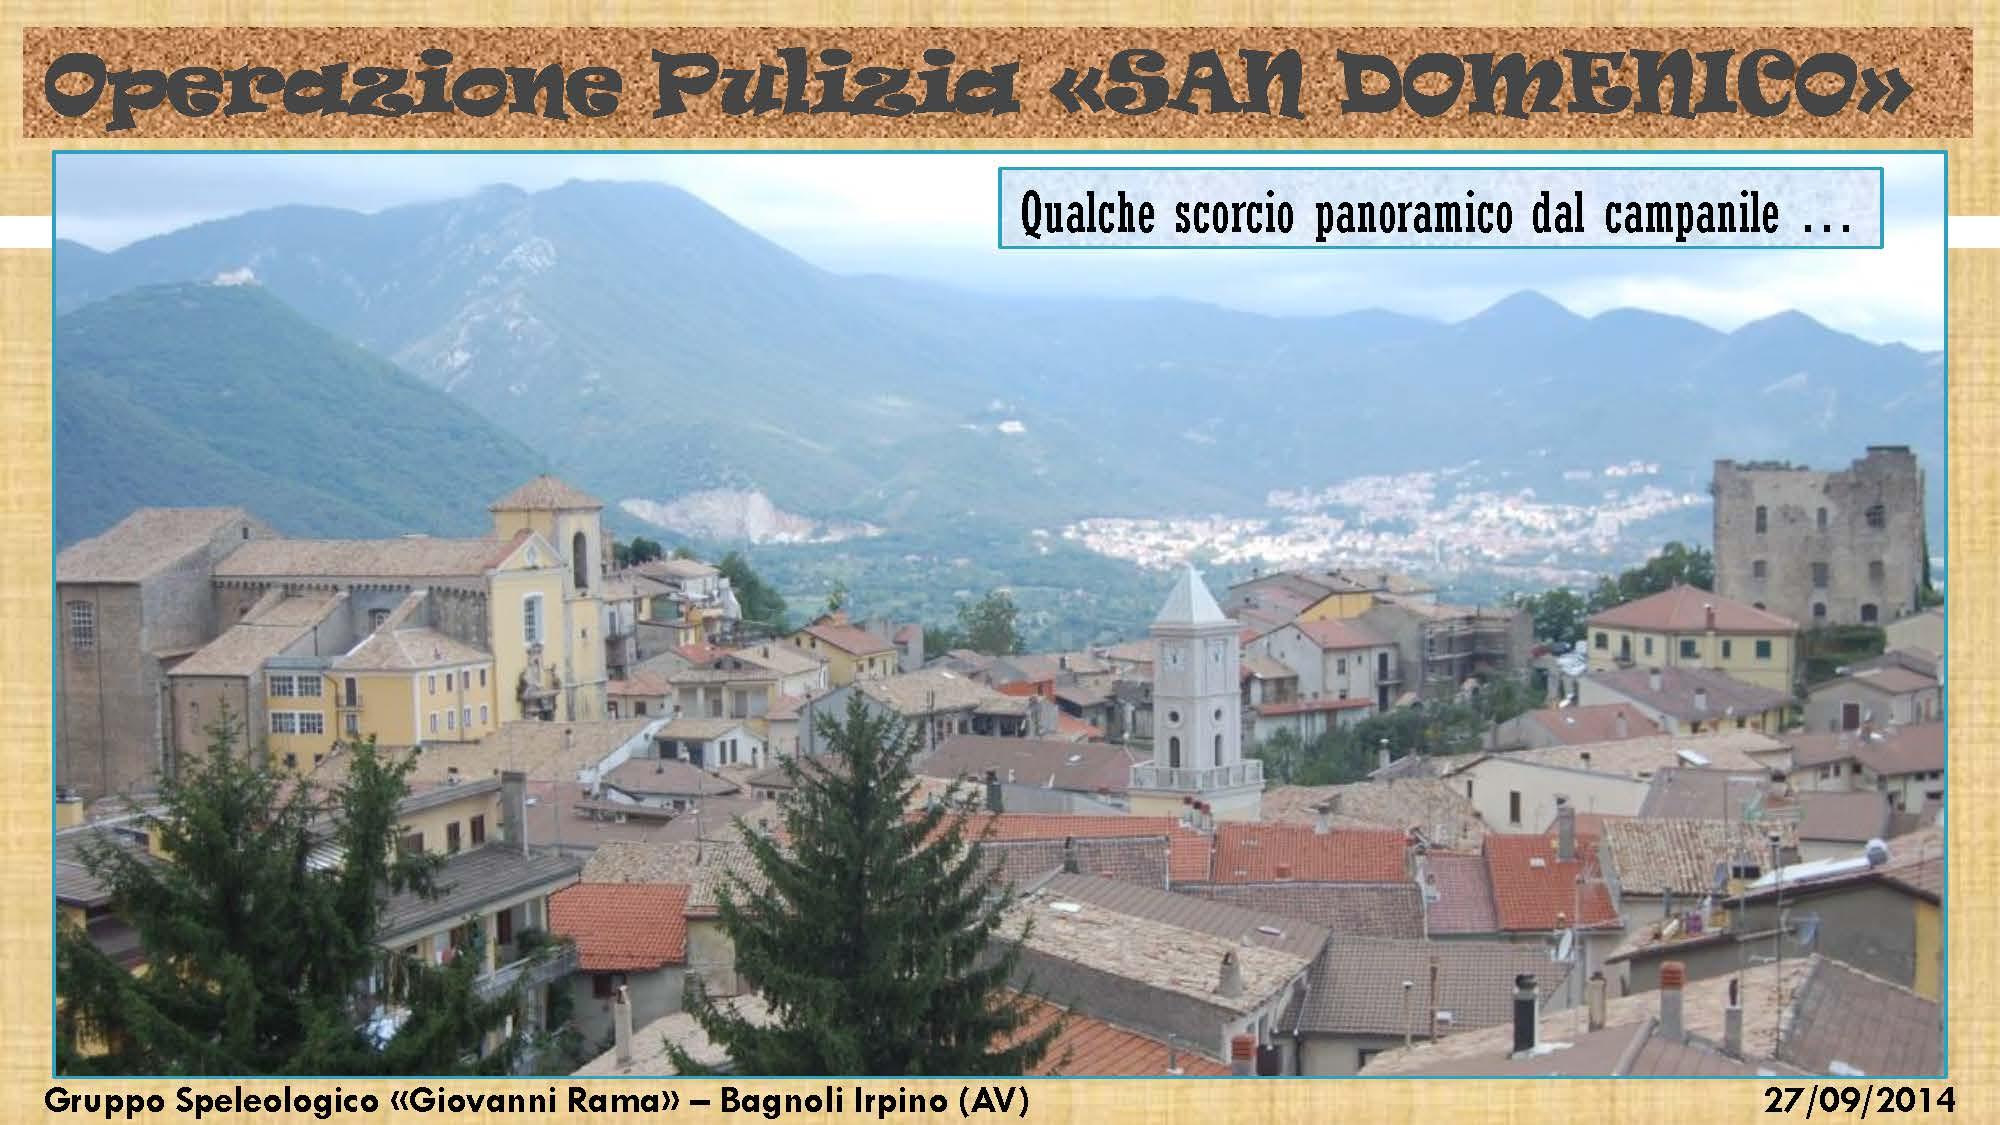 Bagnoli-Pulizia-San-Domenico-2014_Pagina_23